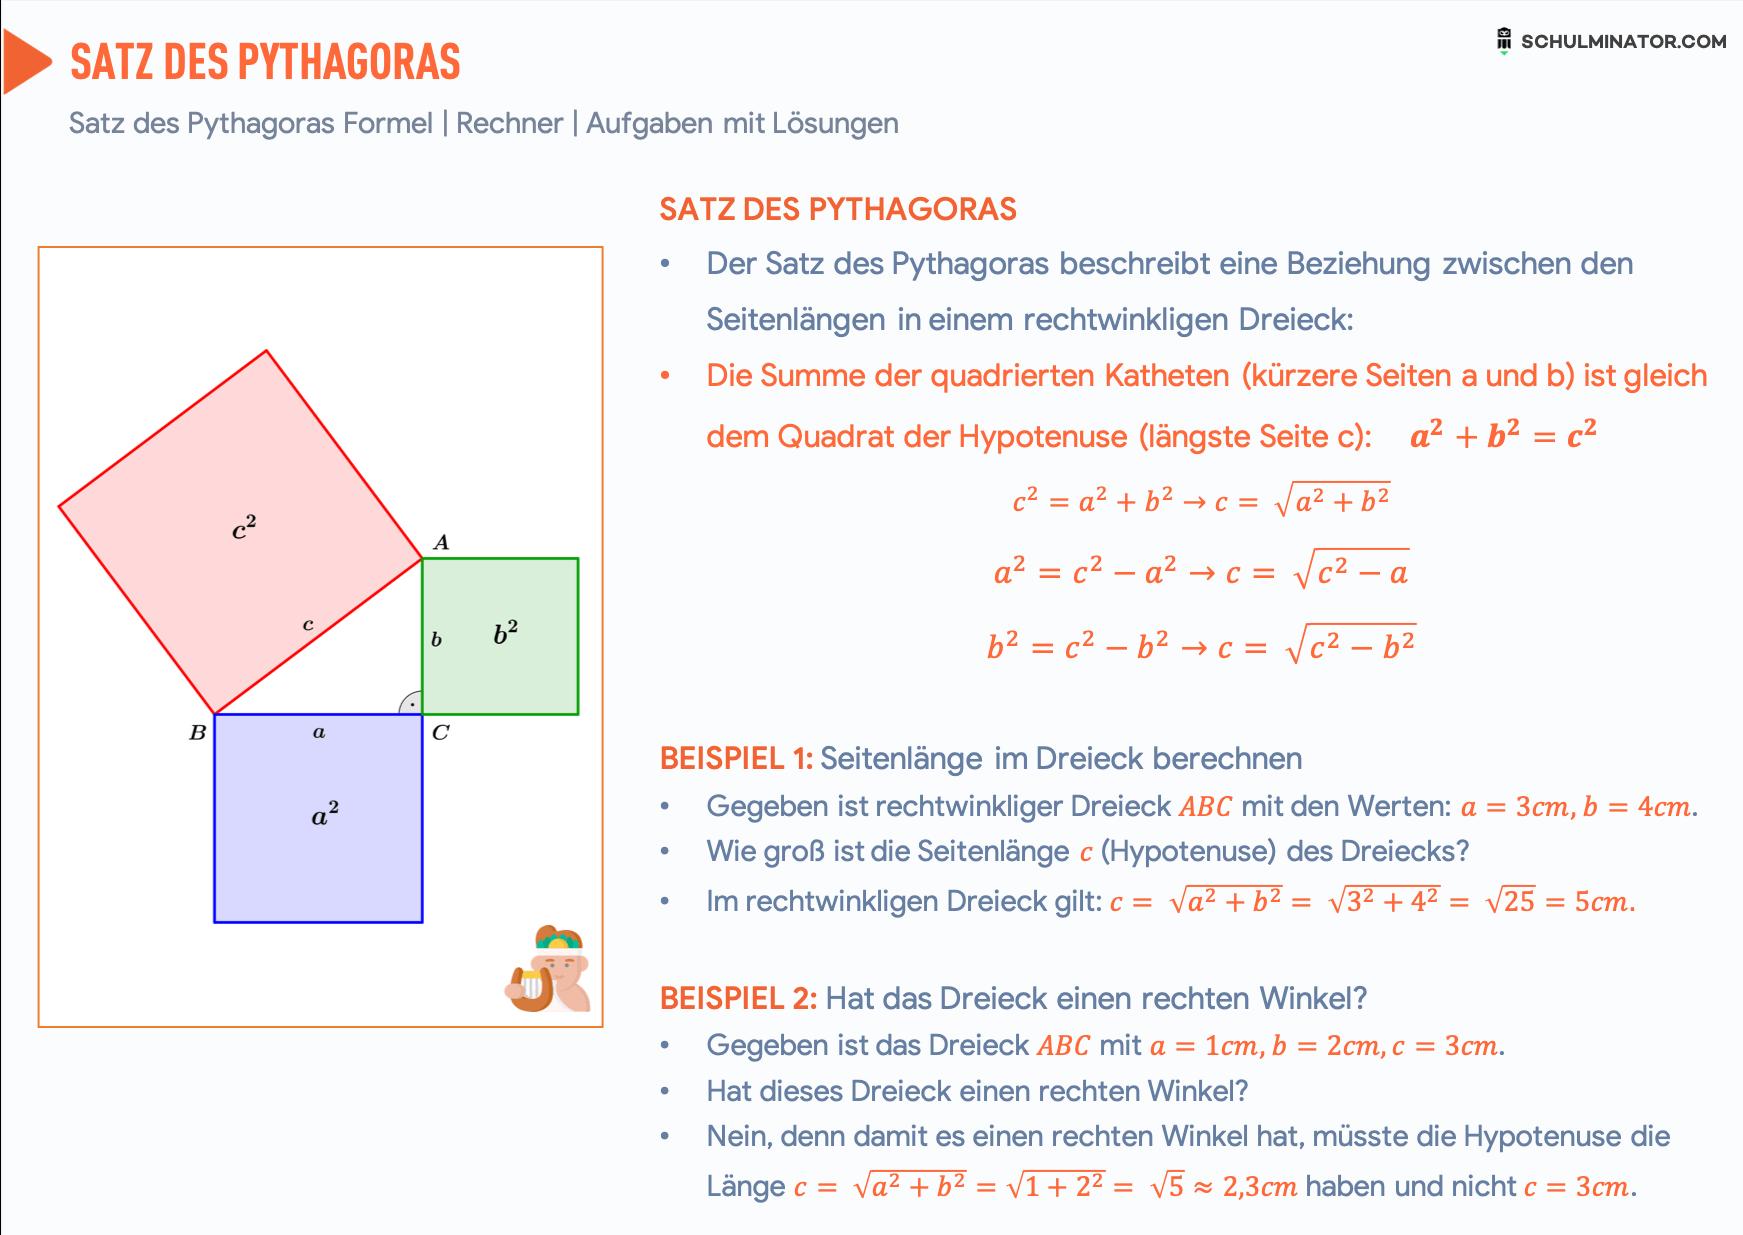 Satz Des Pythagoras Formel Anwendung Satz Des Pythagoras Mathe Formeln Lernen Tipps Schule